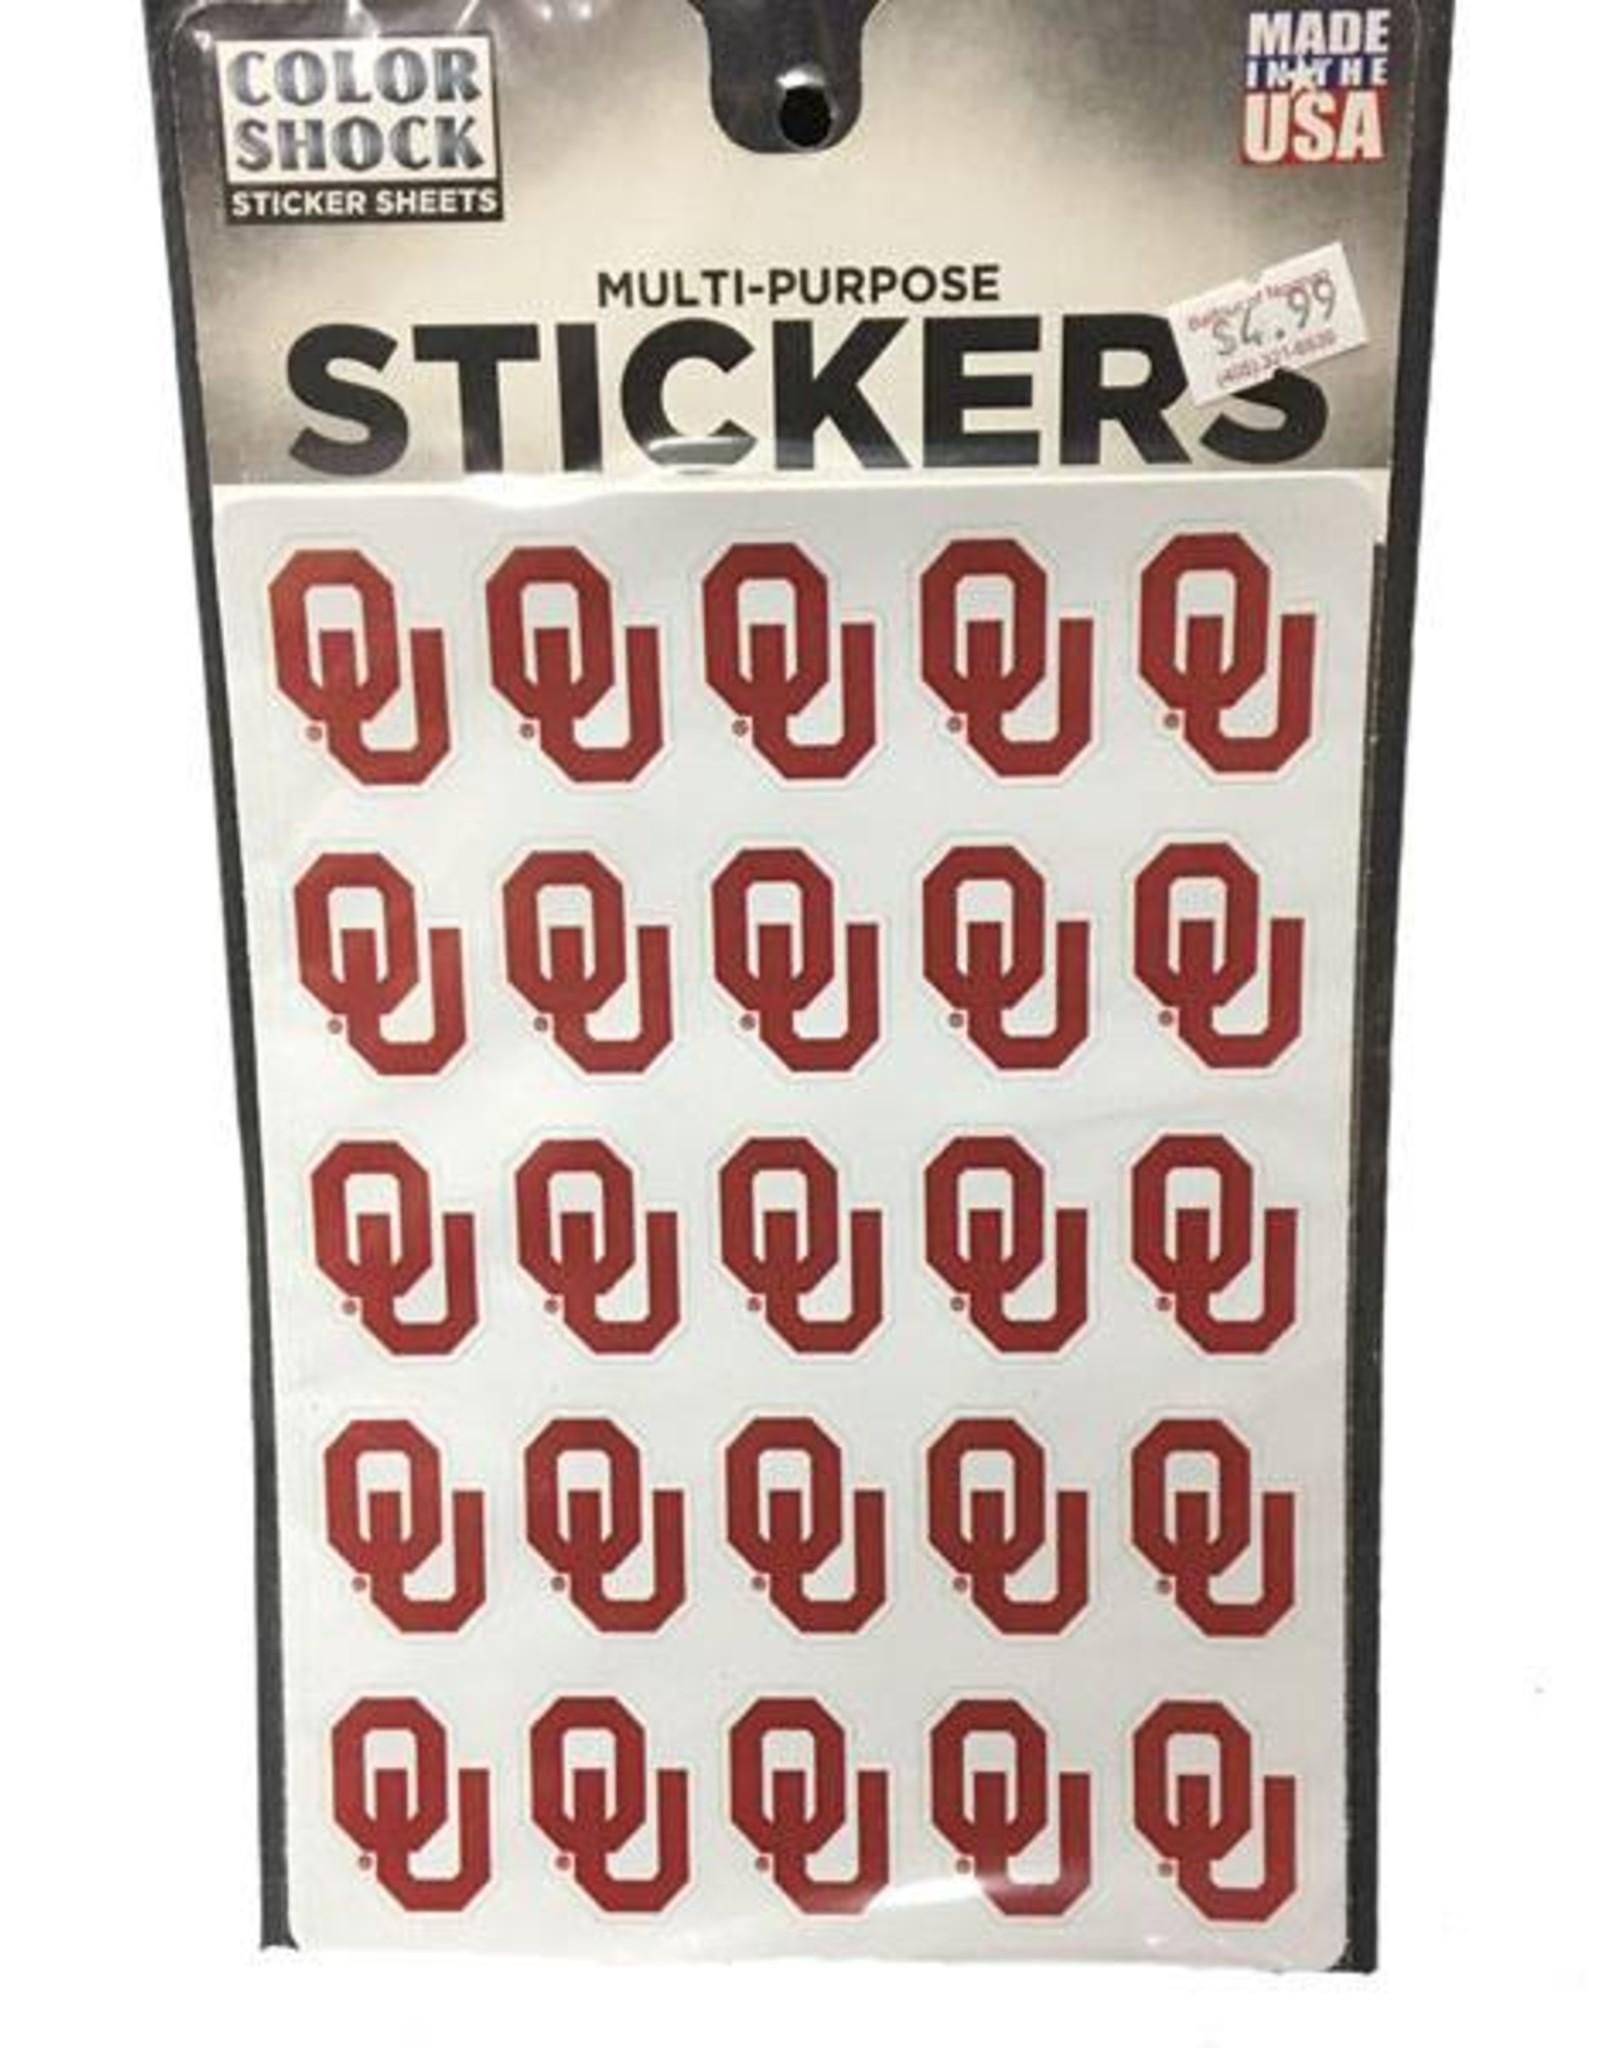 Color Shock OU Multi-Purpose Sticker Sheet (25 Stickers)